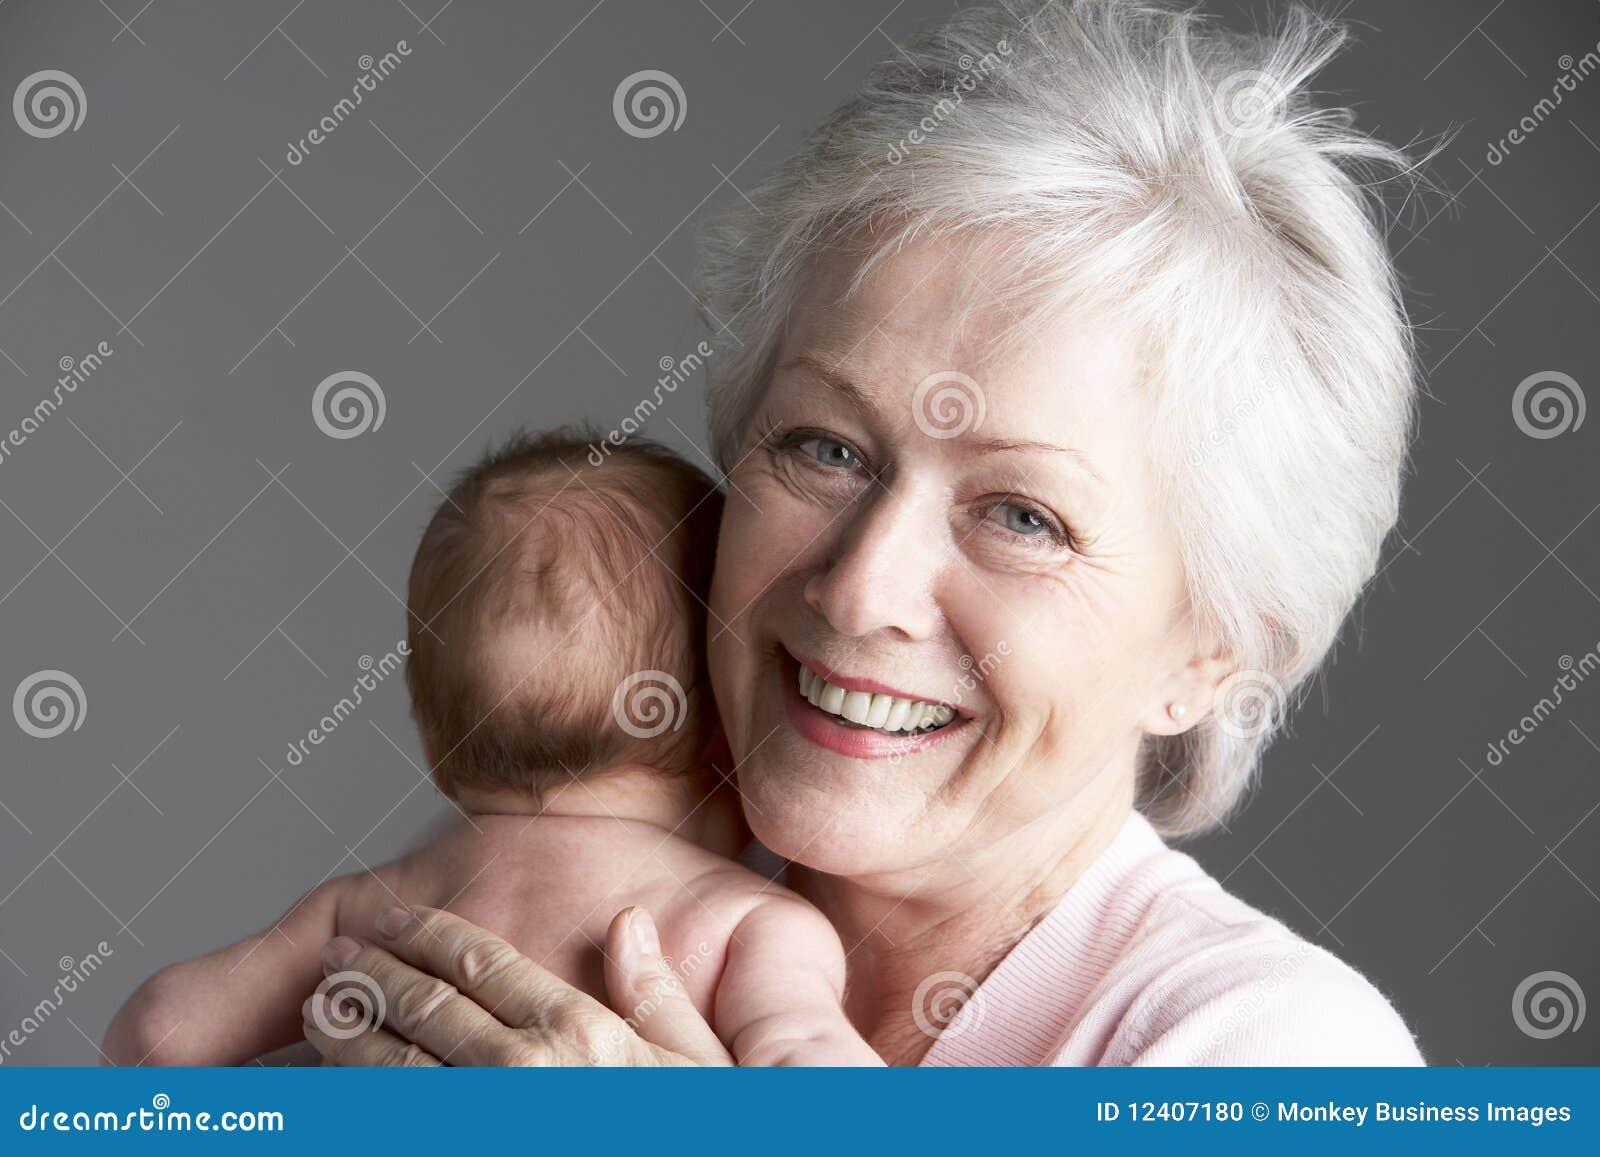 Grandmother Cuddling Granddaughter